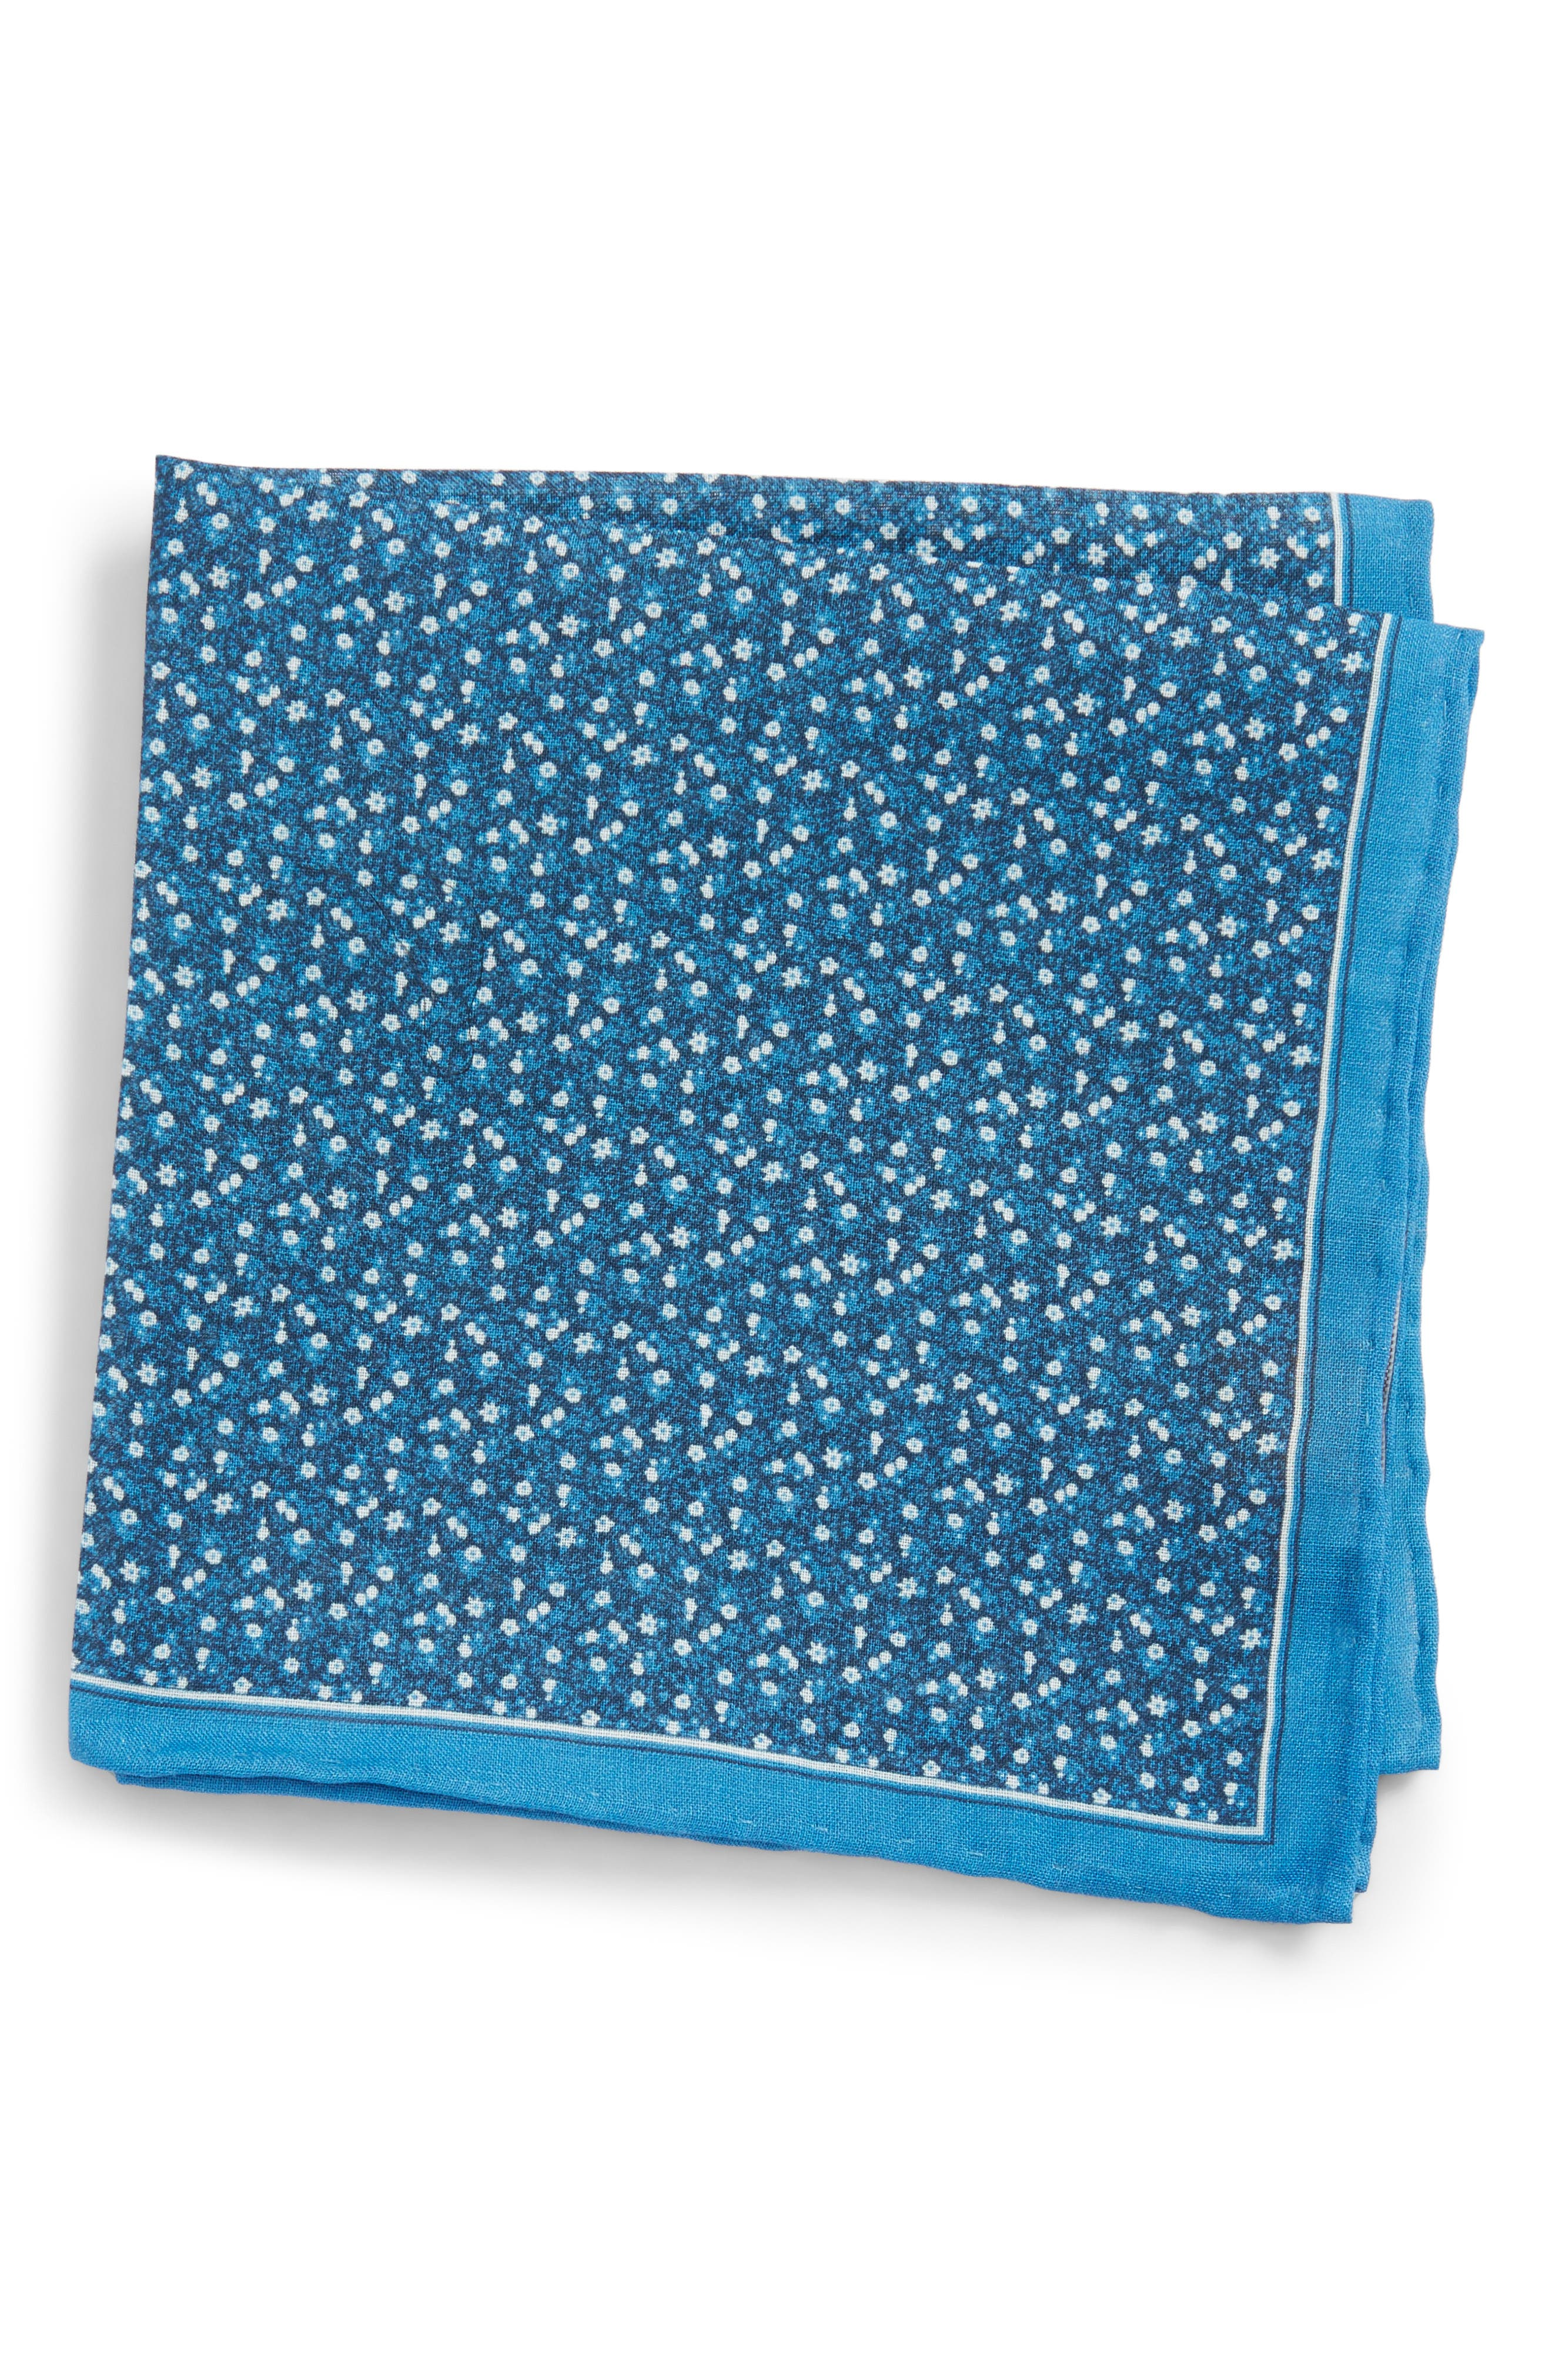 Main Image - The Tie Bar Floral Mark Linen Pocket Square